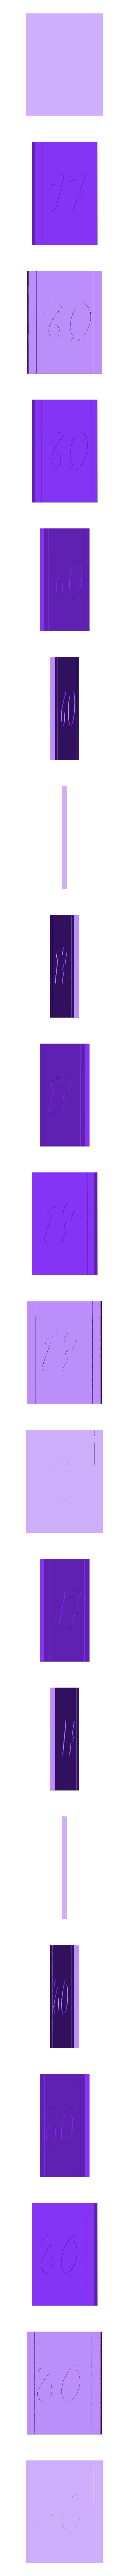 17_-_2.stl Download free SCAD file Perpetual Flip Calendar (W/ Customizable Font) • 3D printable model, Dsk